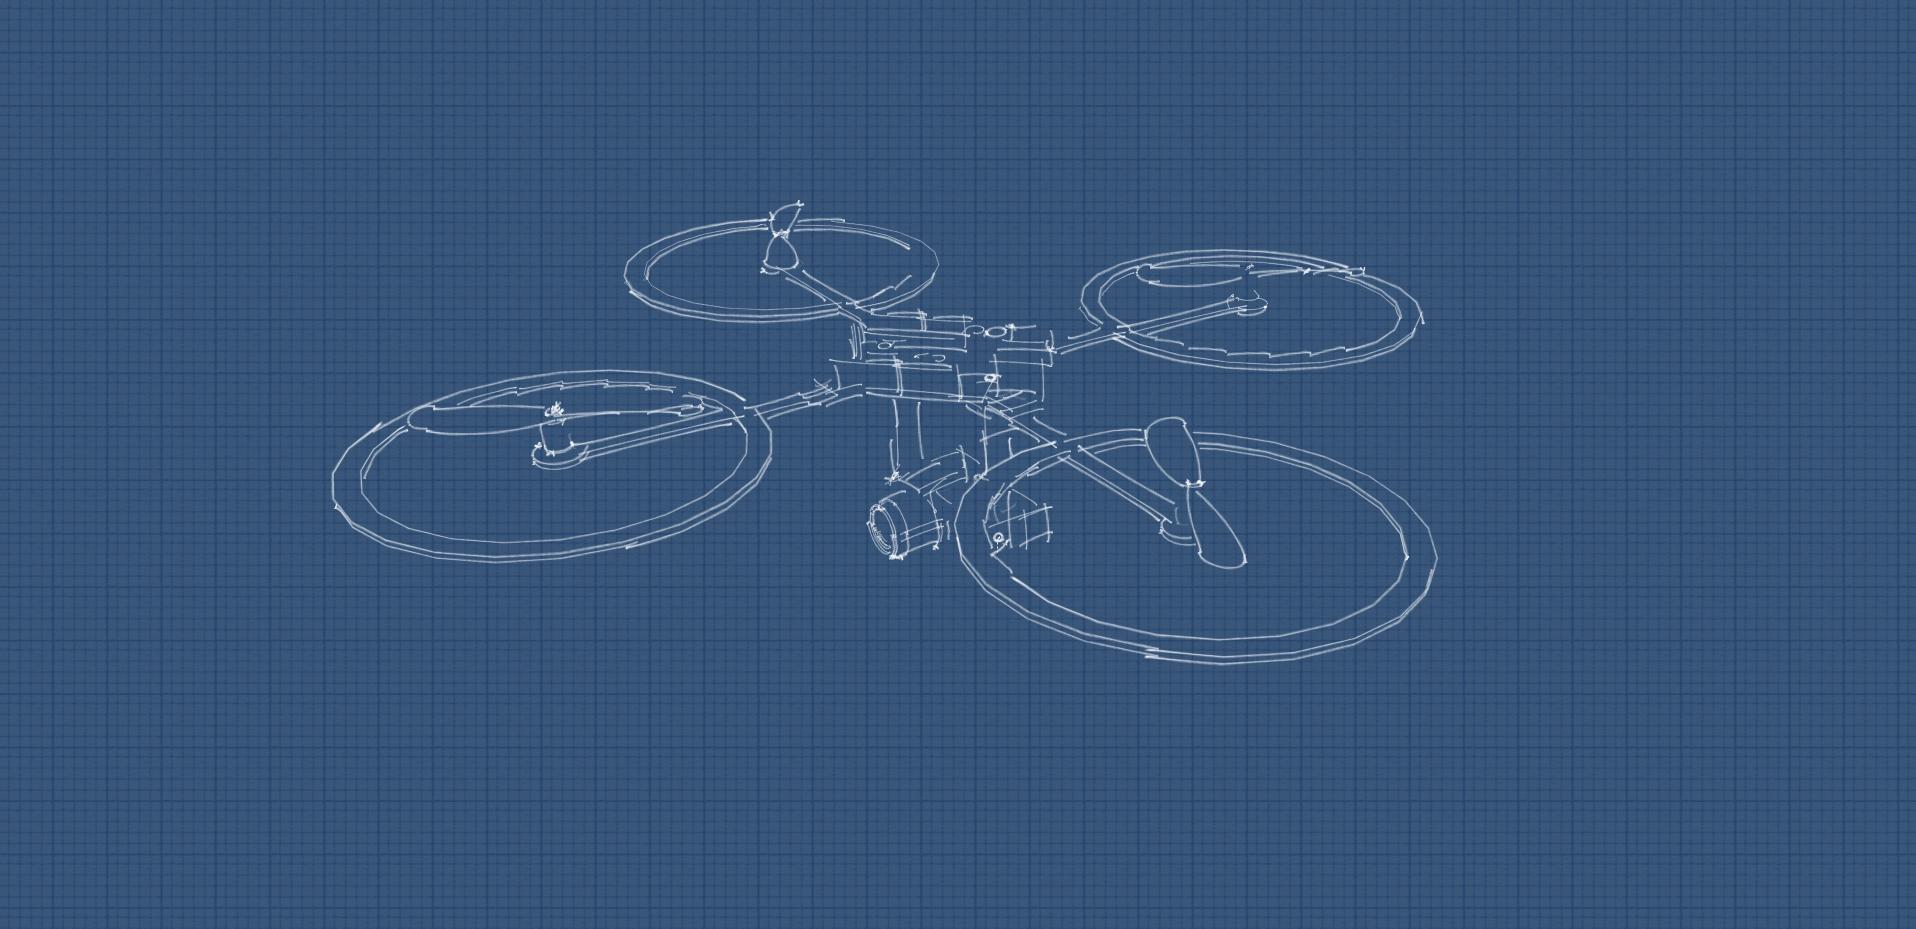 drones civil engineering